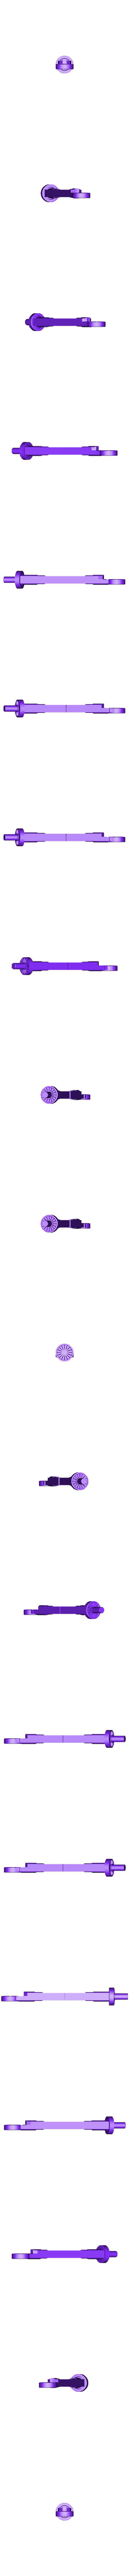 Jawa Shuttle scooter (crane part a).stl Download free STL file Jawa Shuttle Scooter • 3D printer template, polerix